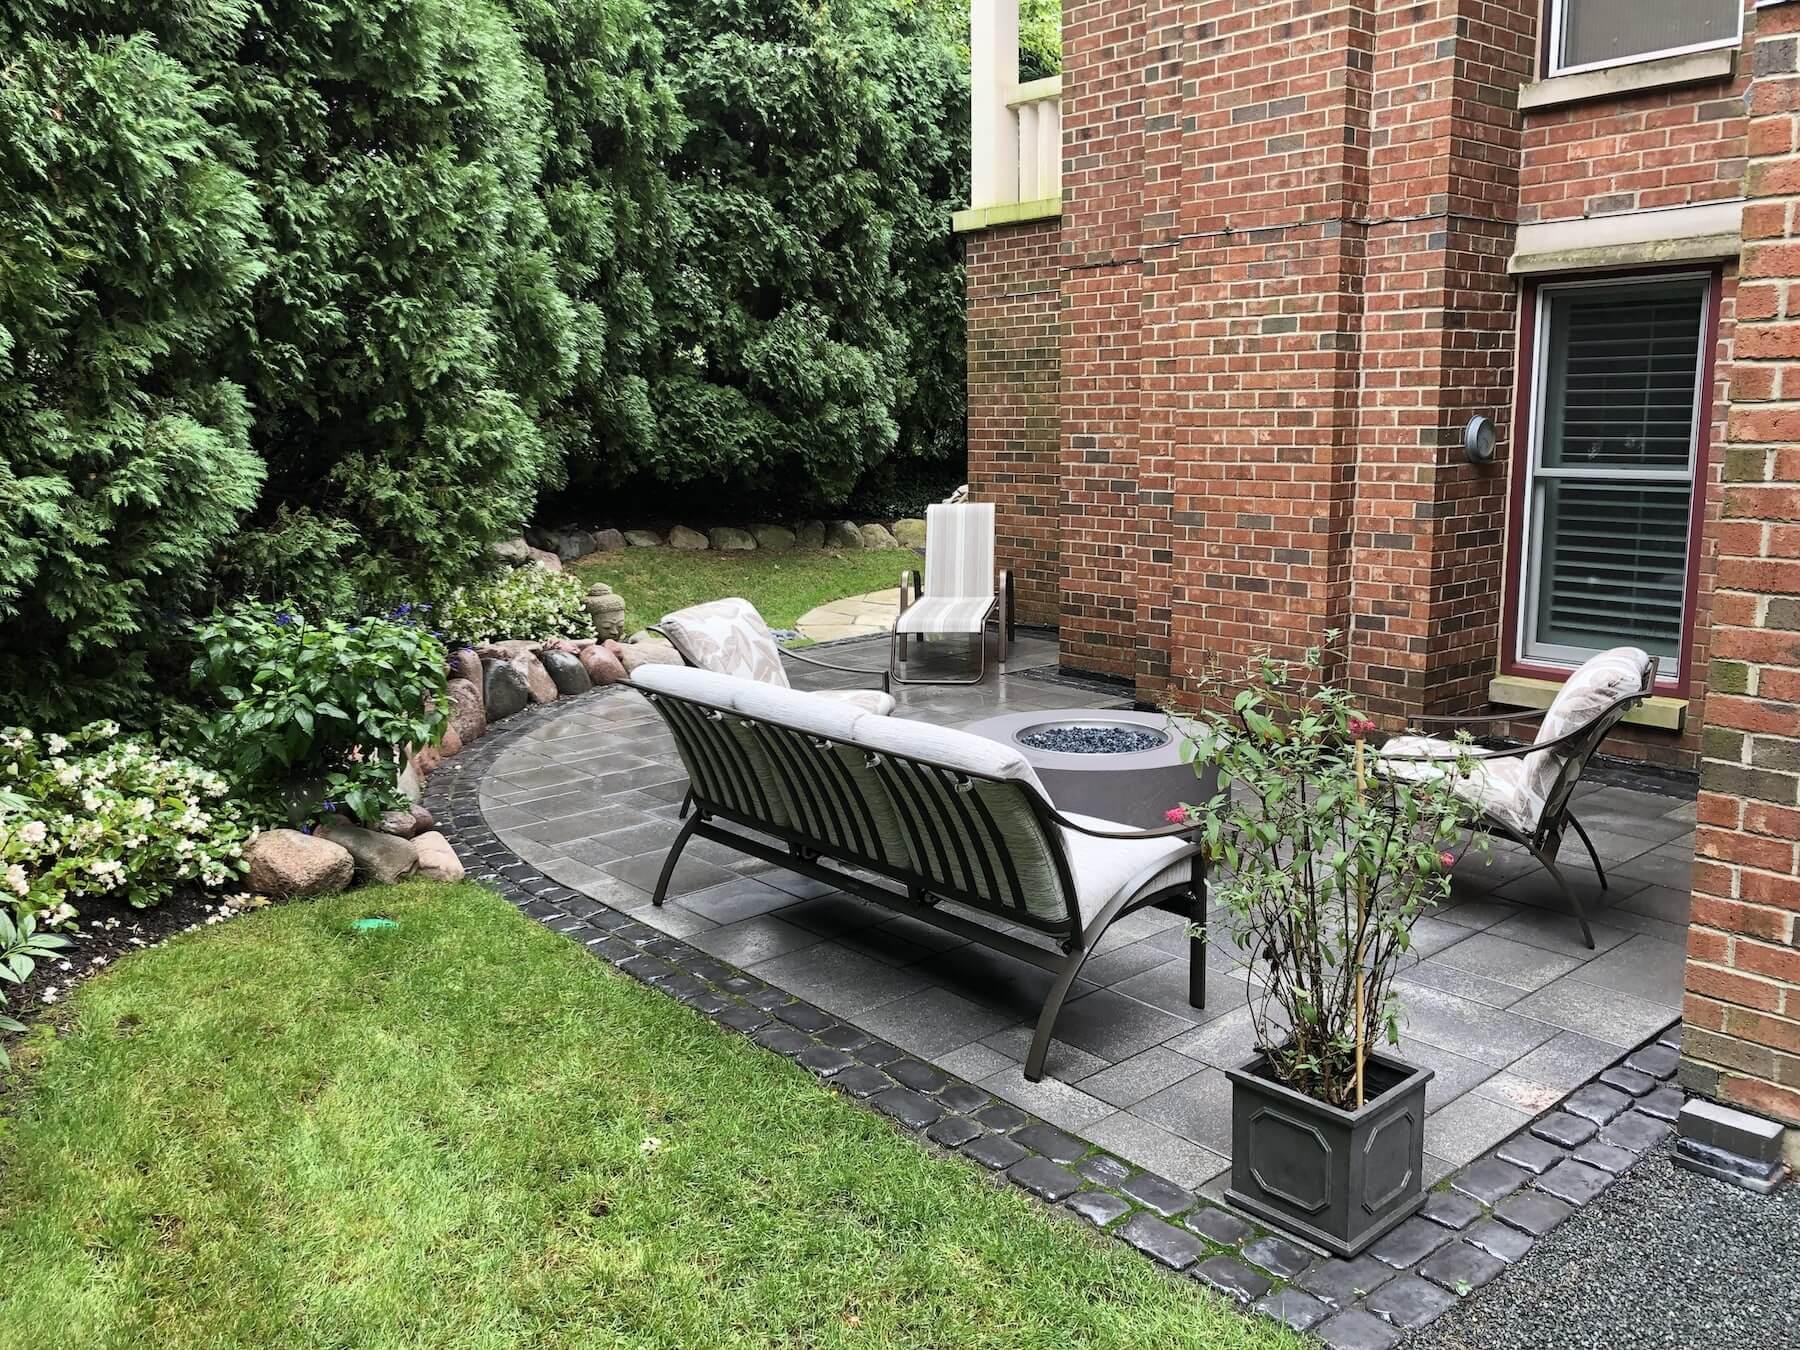 unilock paver patio furniture fire pit landscaping winnetka il